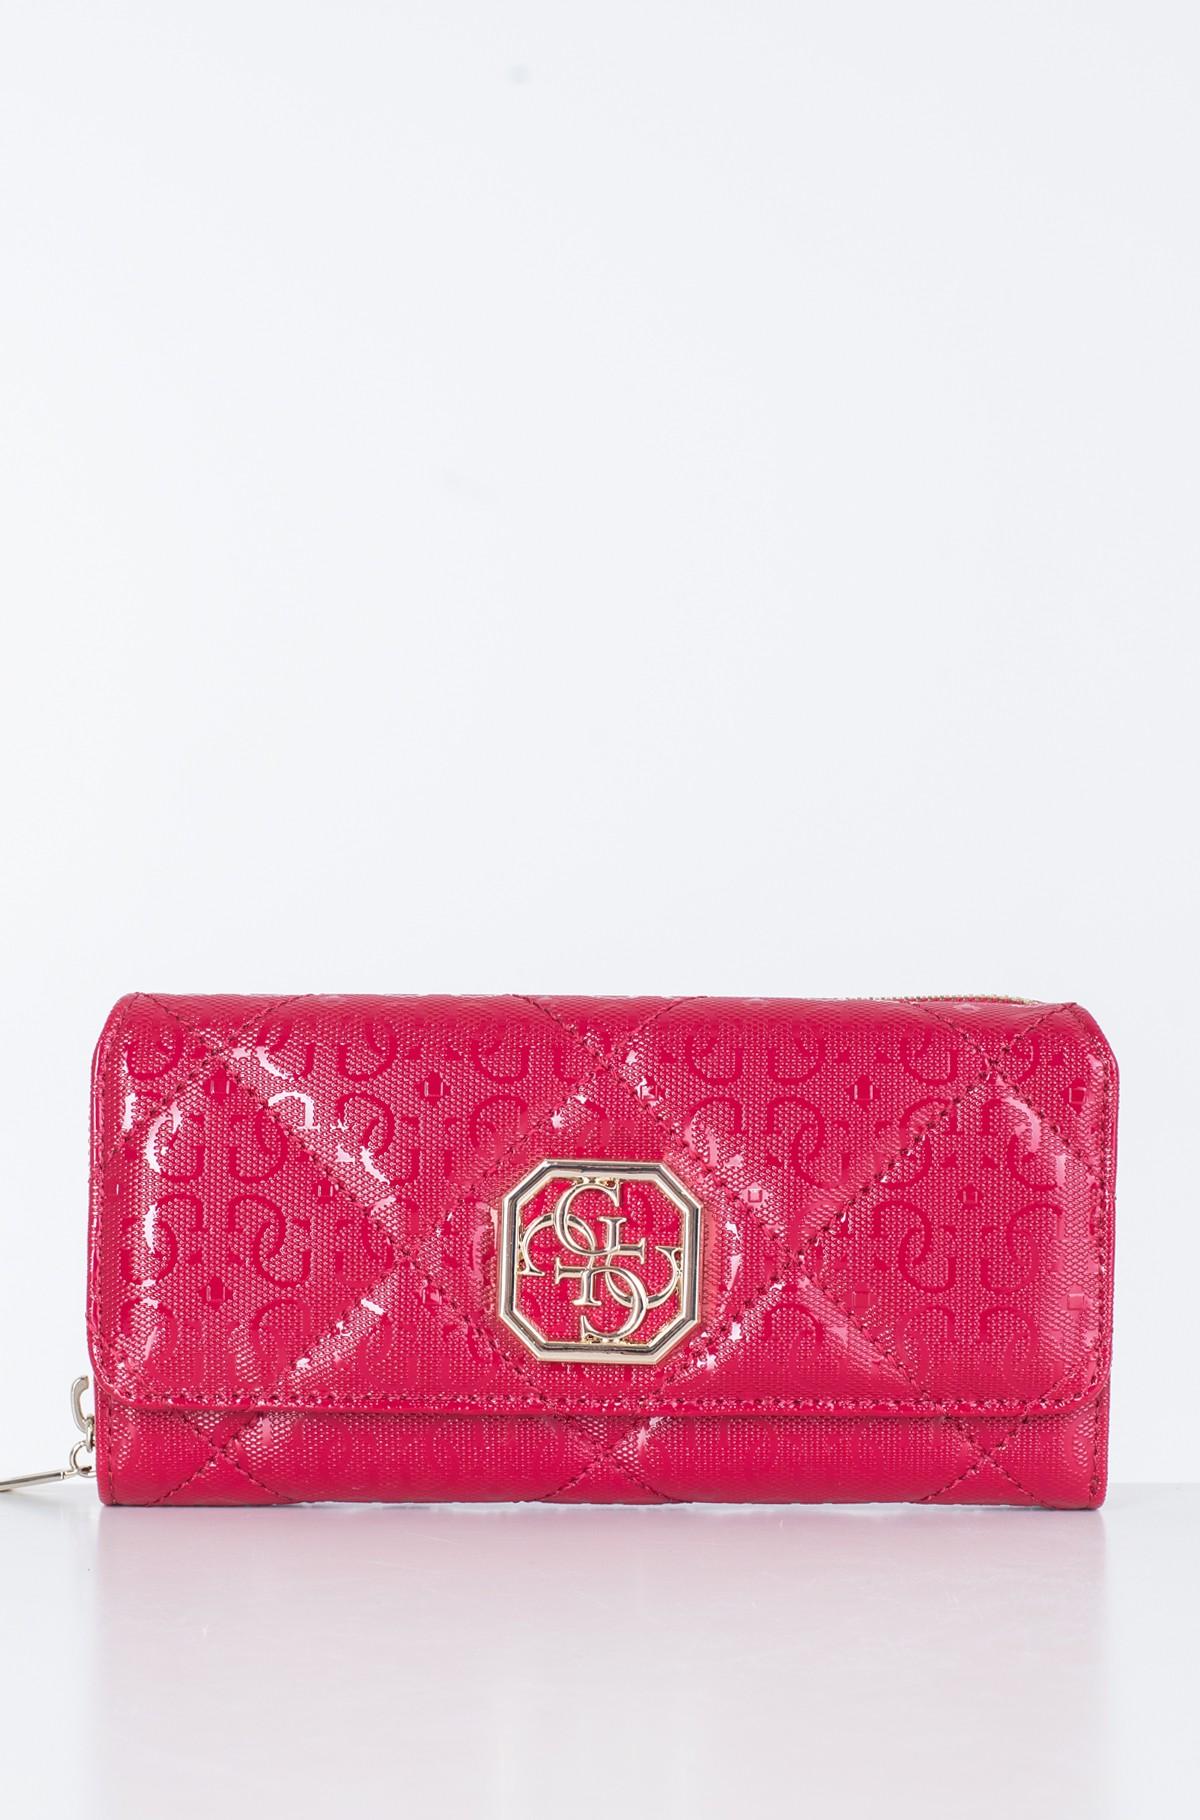 Wallet SWSG79 71620-full-1